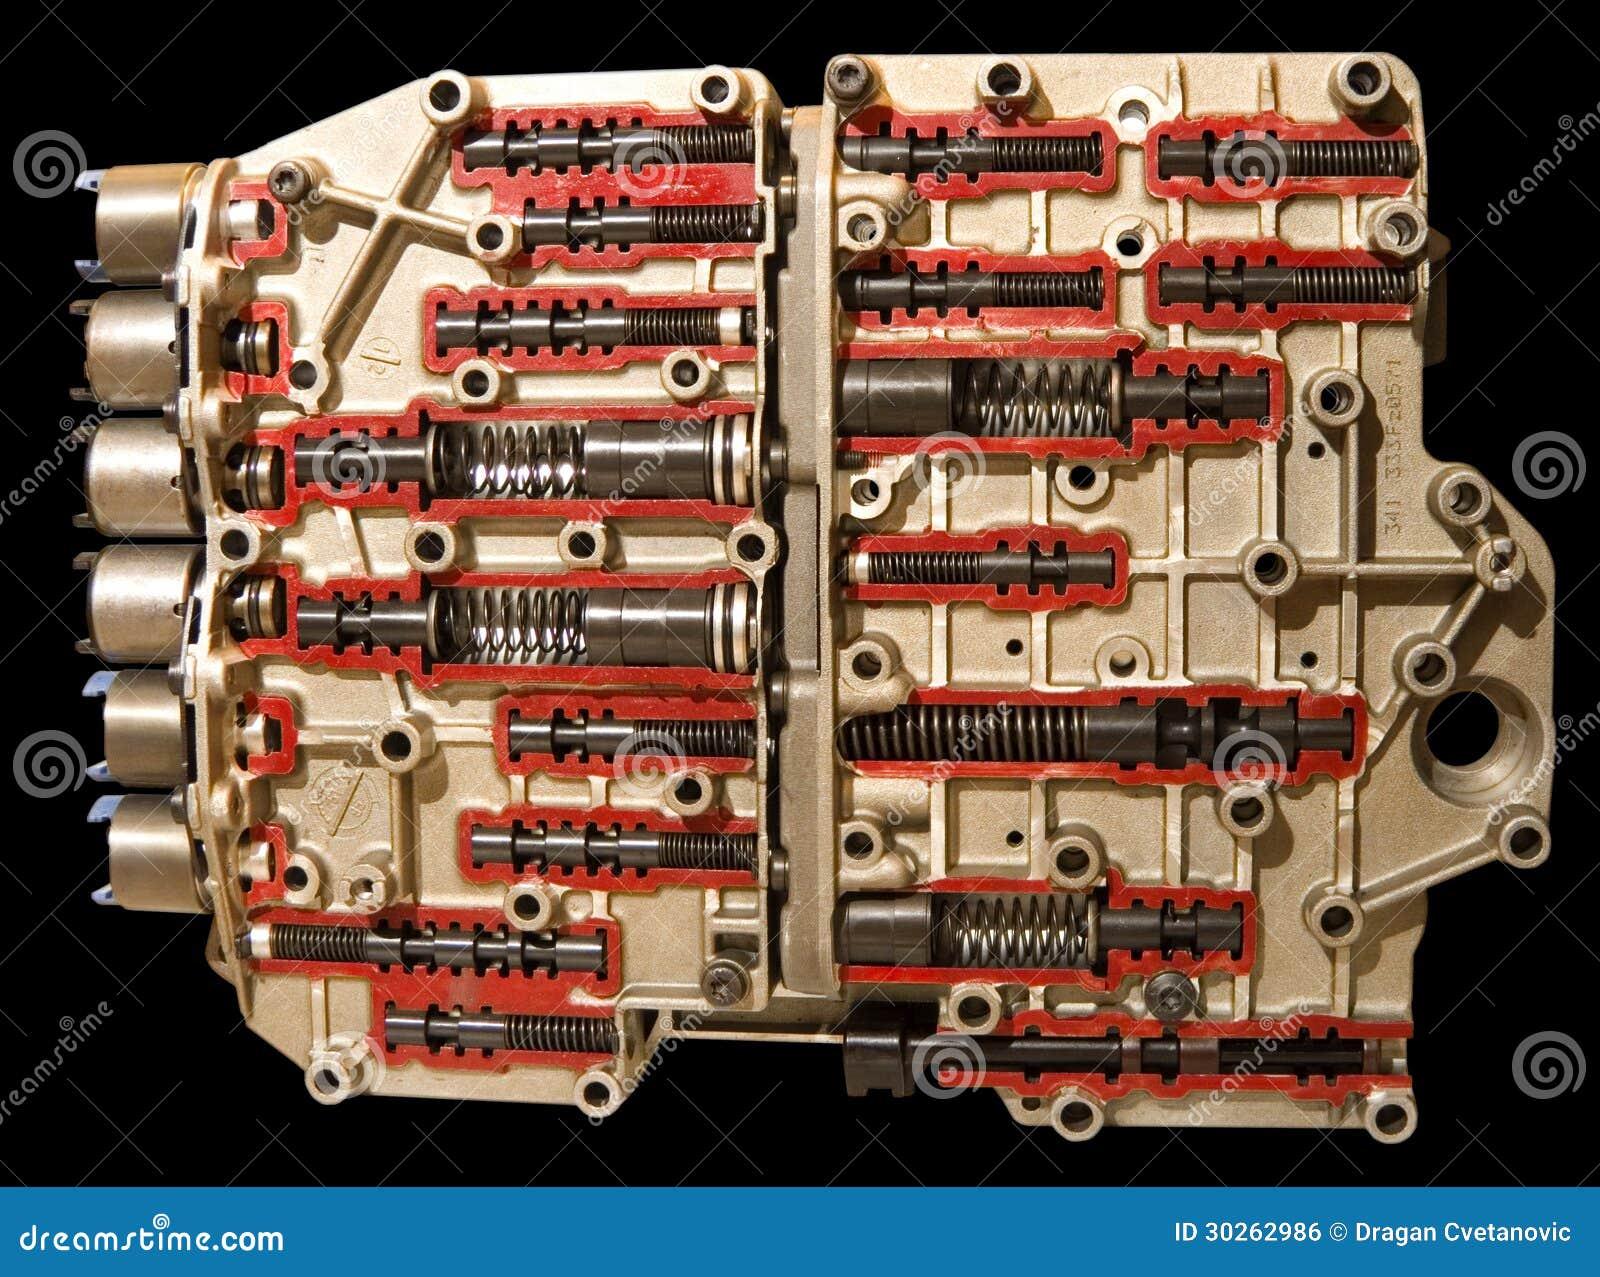 Automatic Transmission Valve Body Shift Kit Royalty Free